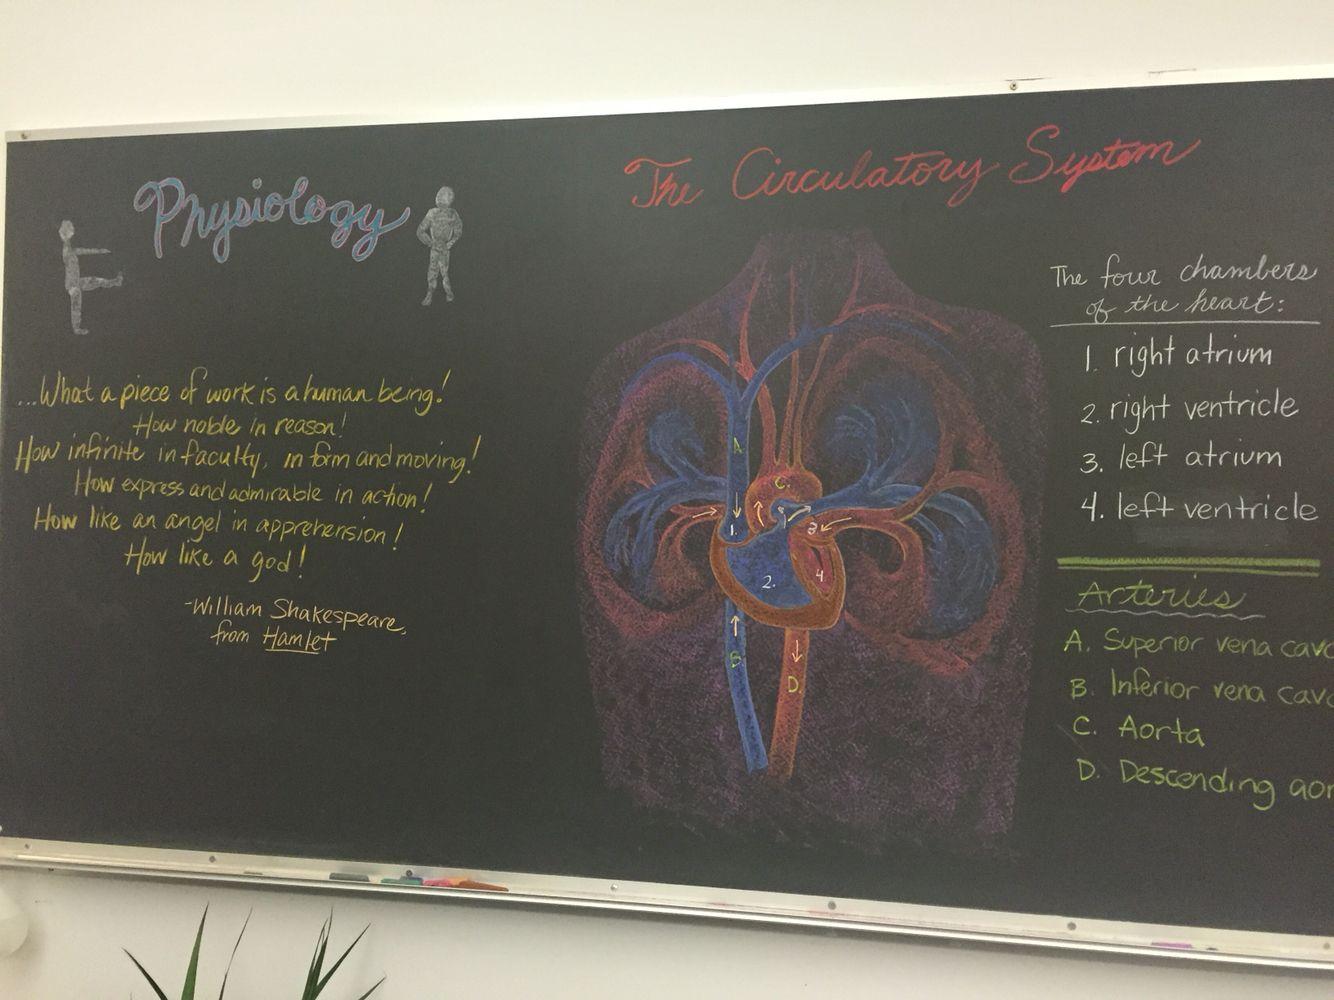 Circulatory System Physiology Chalkboard Grade 7 Waldorf